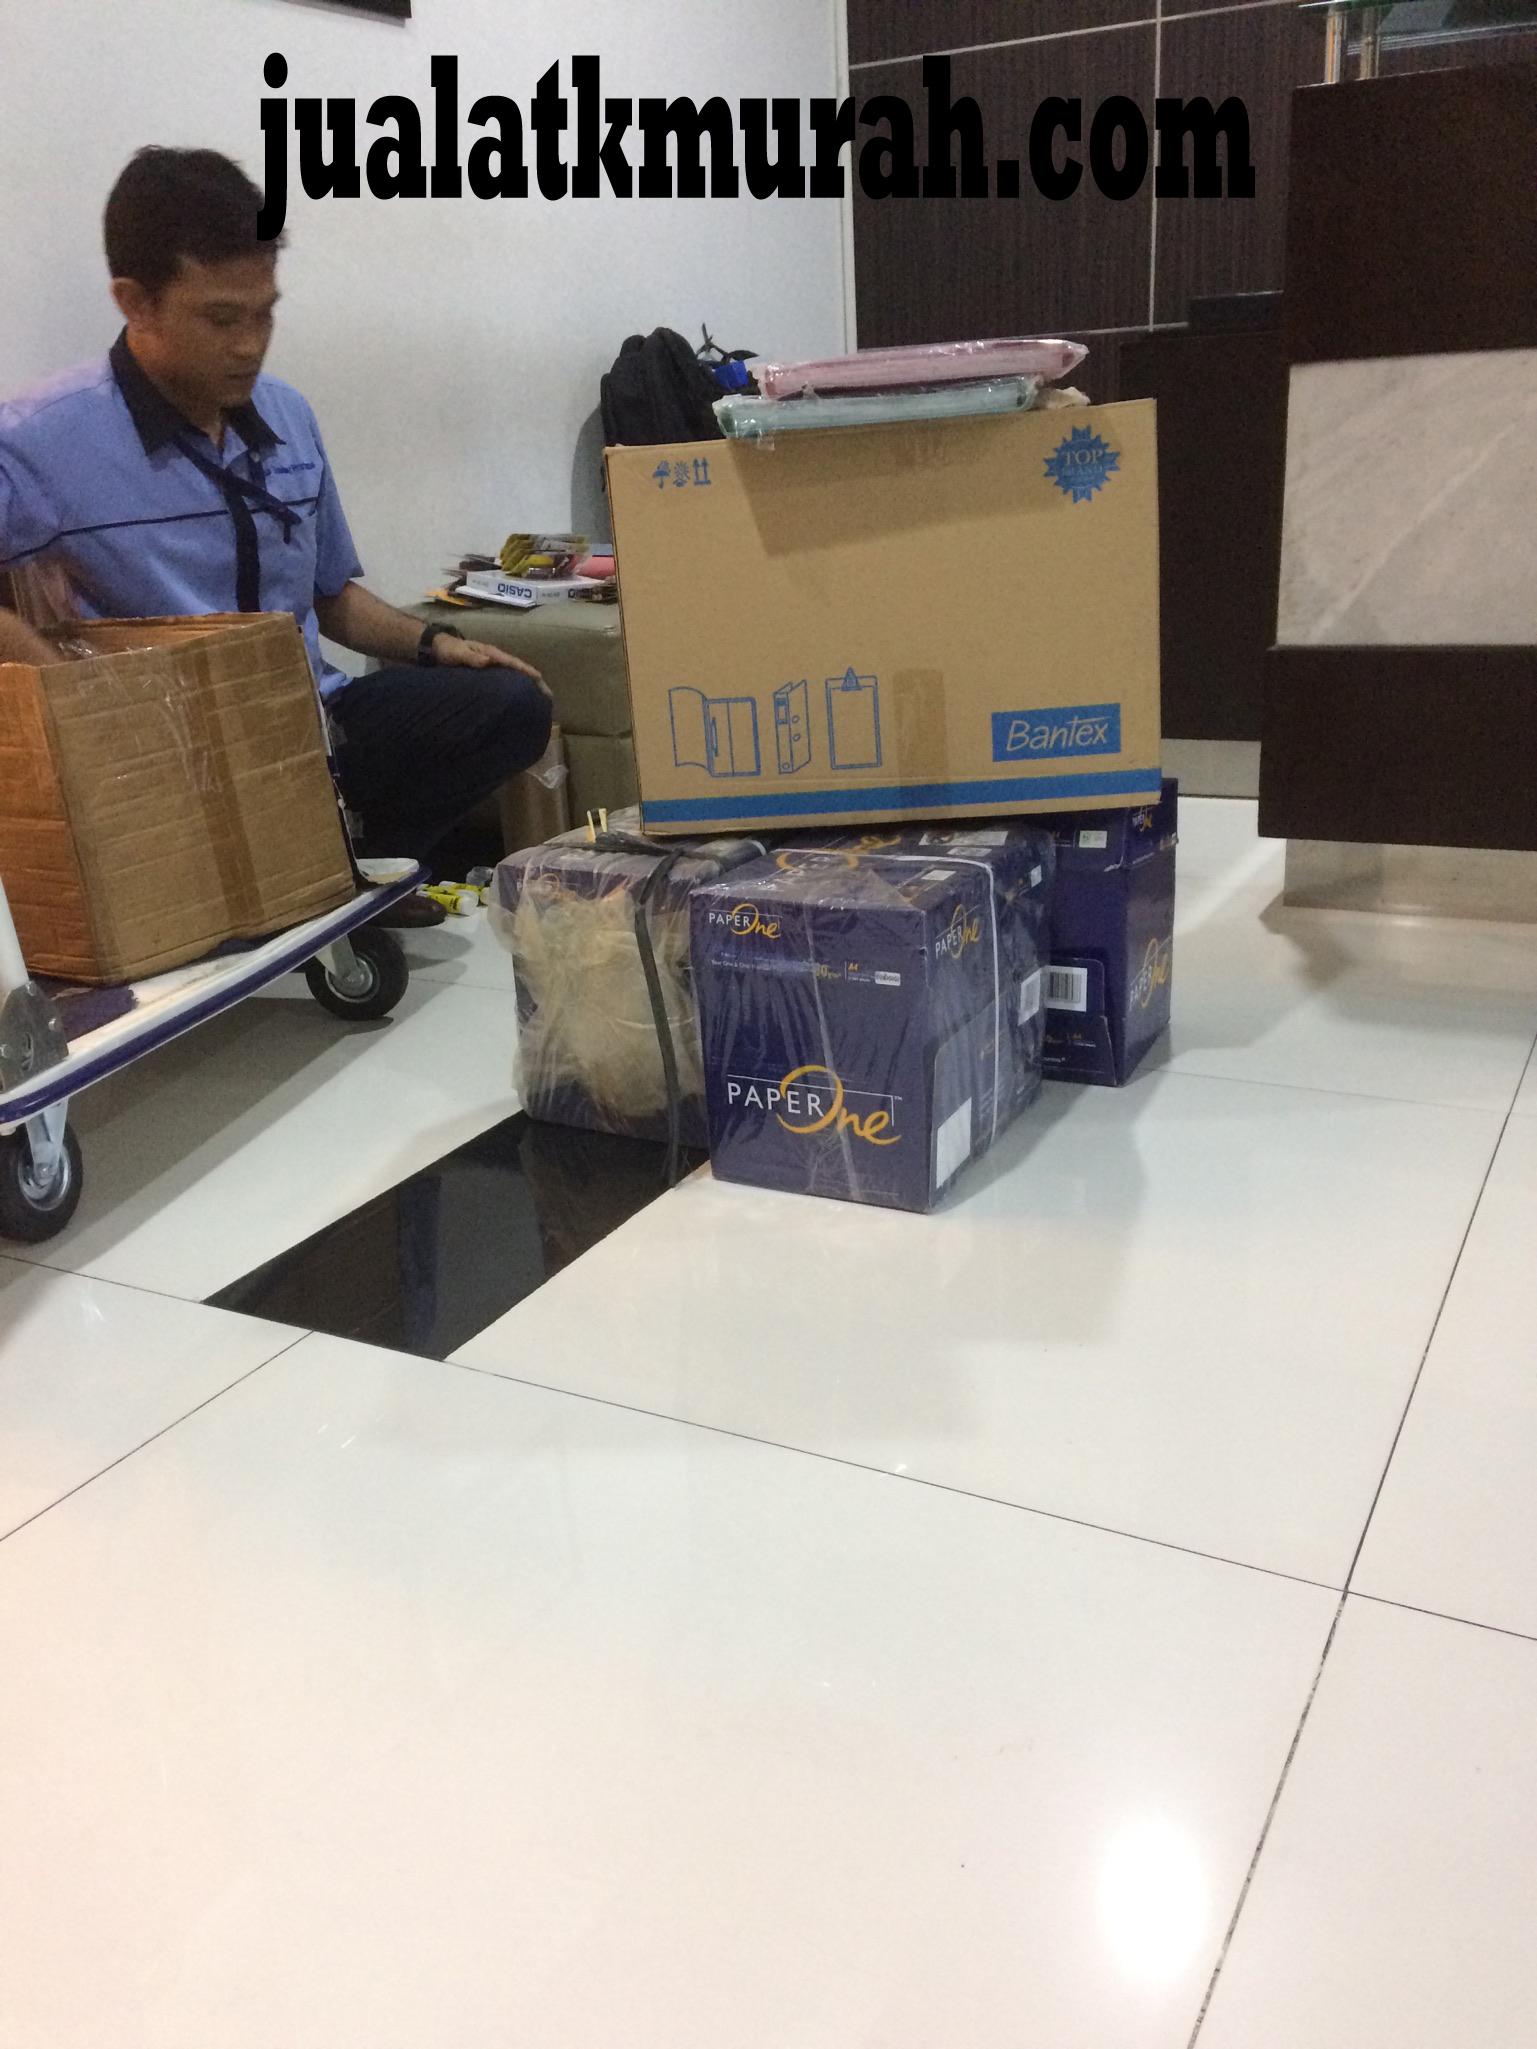 Jual ATK Murah Cilincing Jakarta Utara